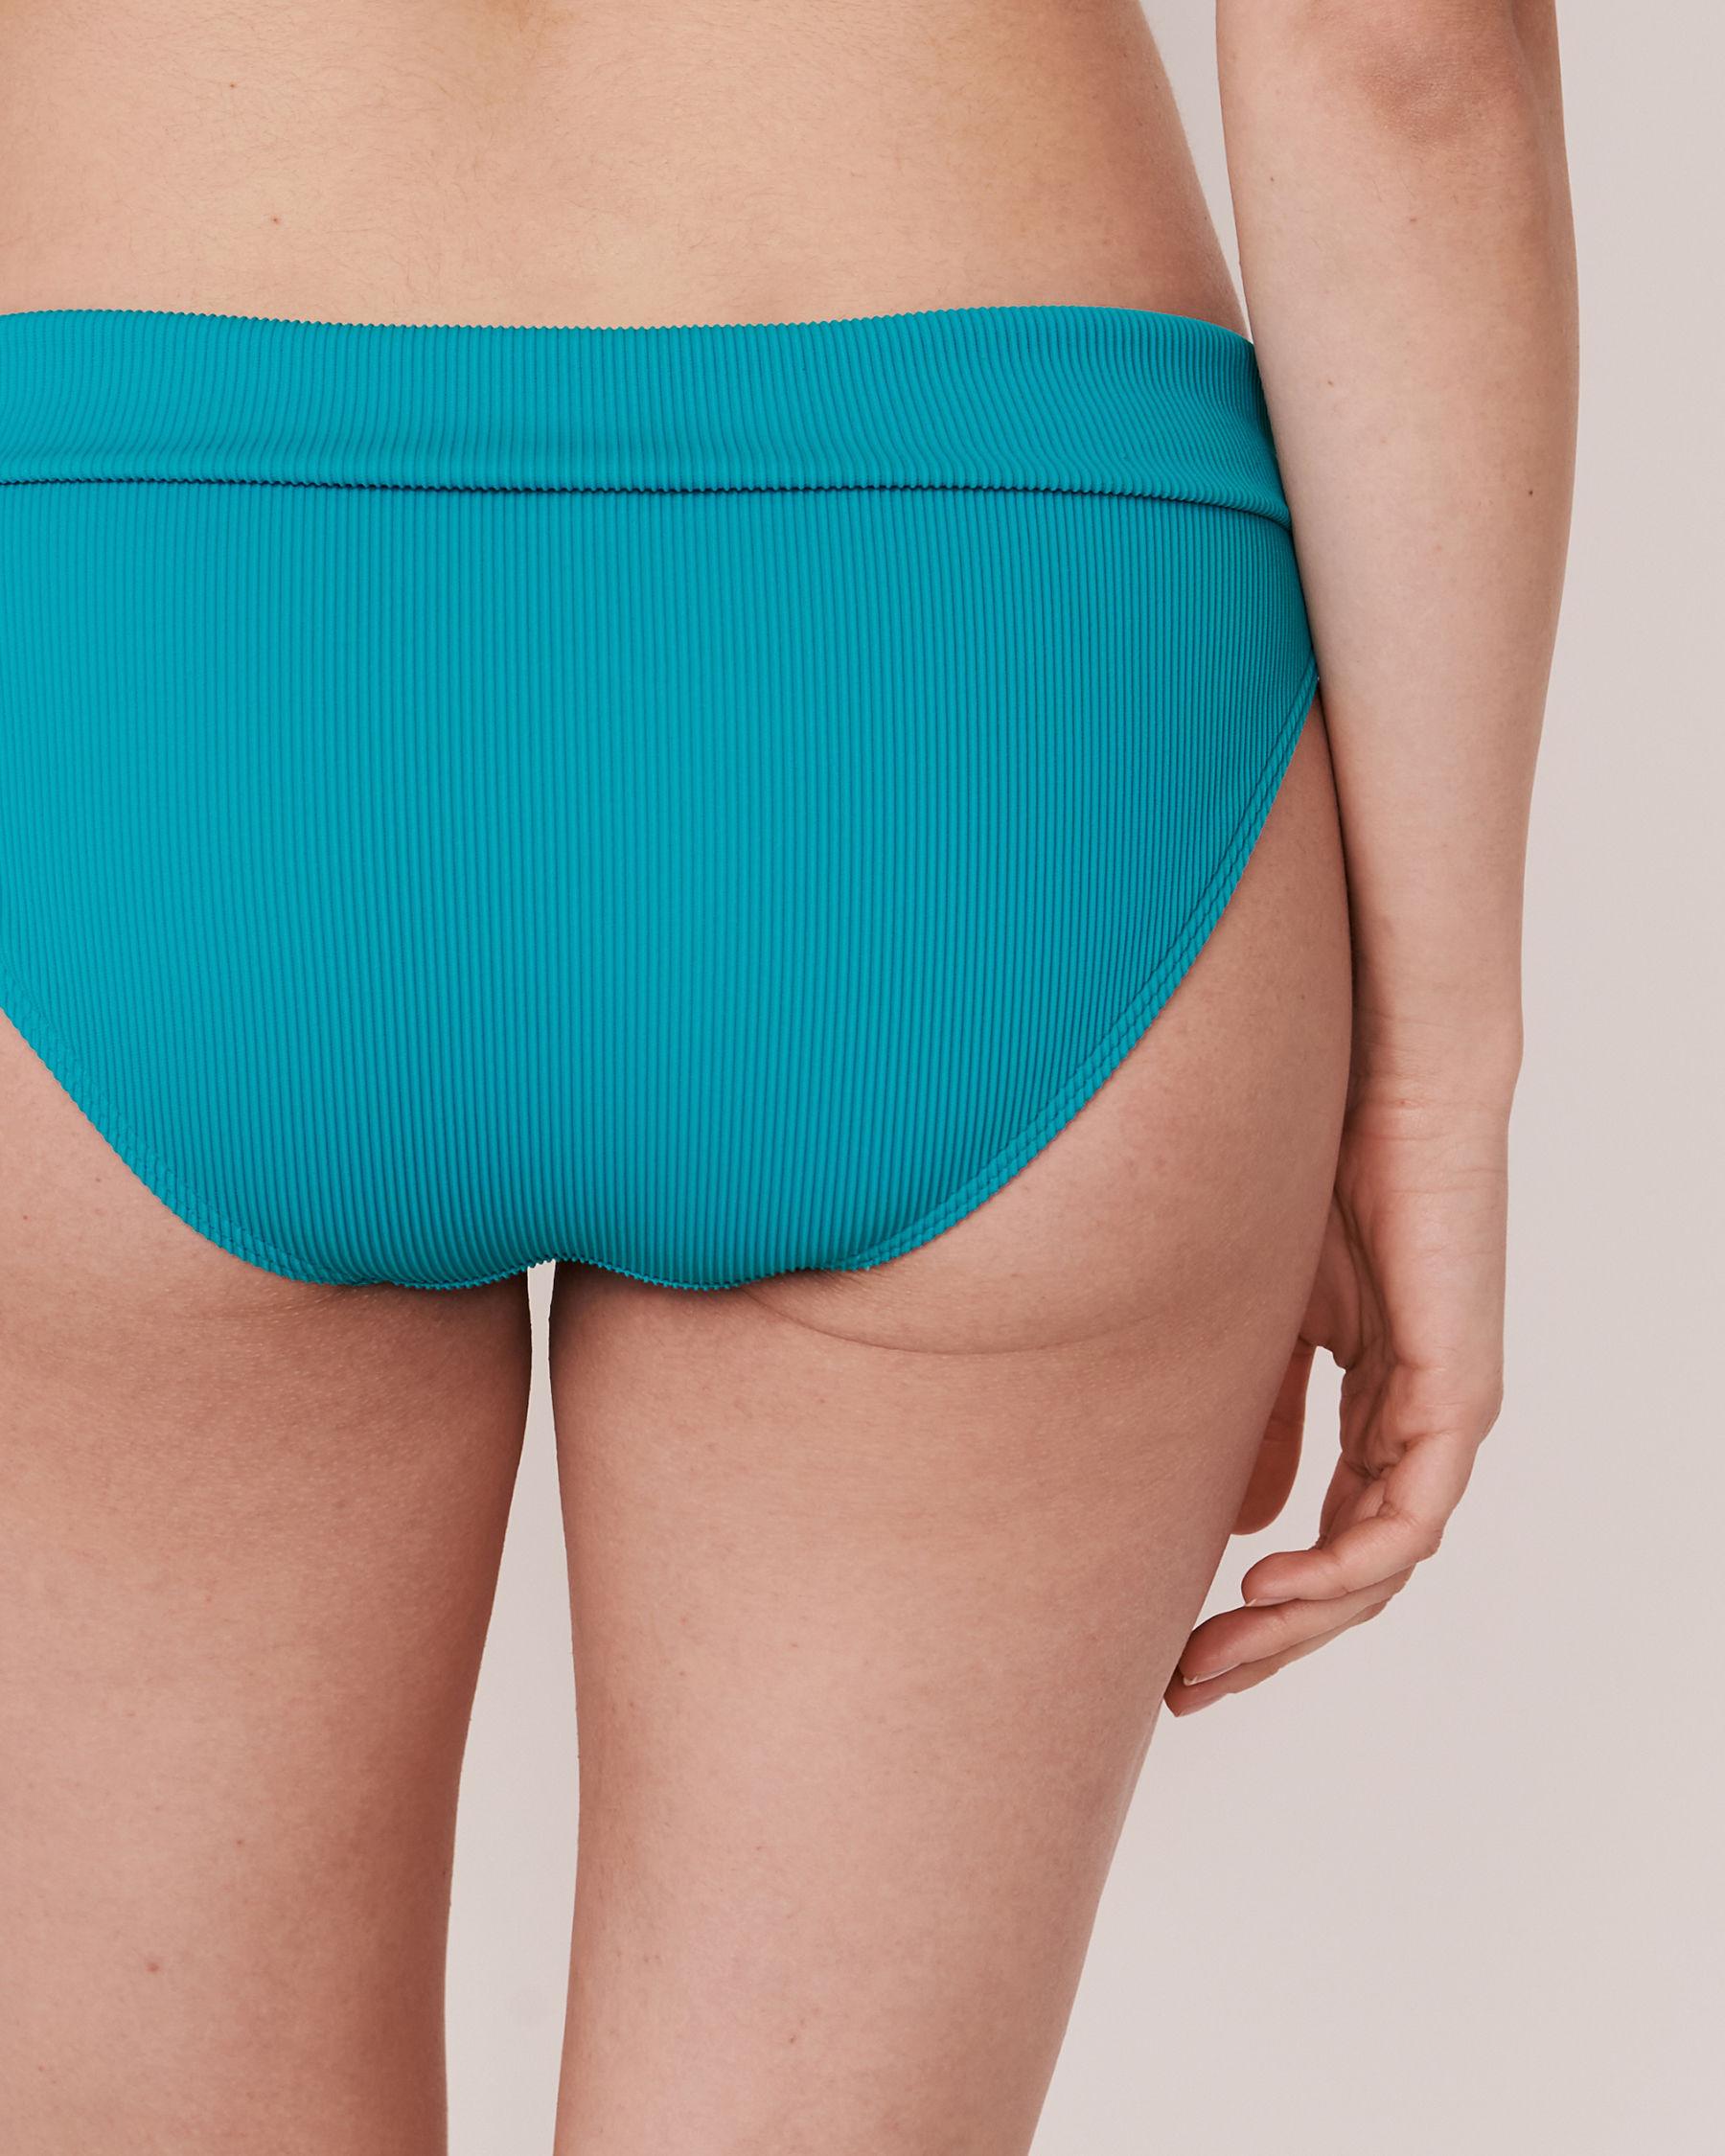 LA VIE EN ROSE AQUA Bas de bikini bande de taille pliable en fibres recyclées TOOTSIE RIB Bleu 70300063 - Voir2